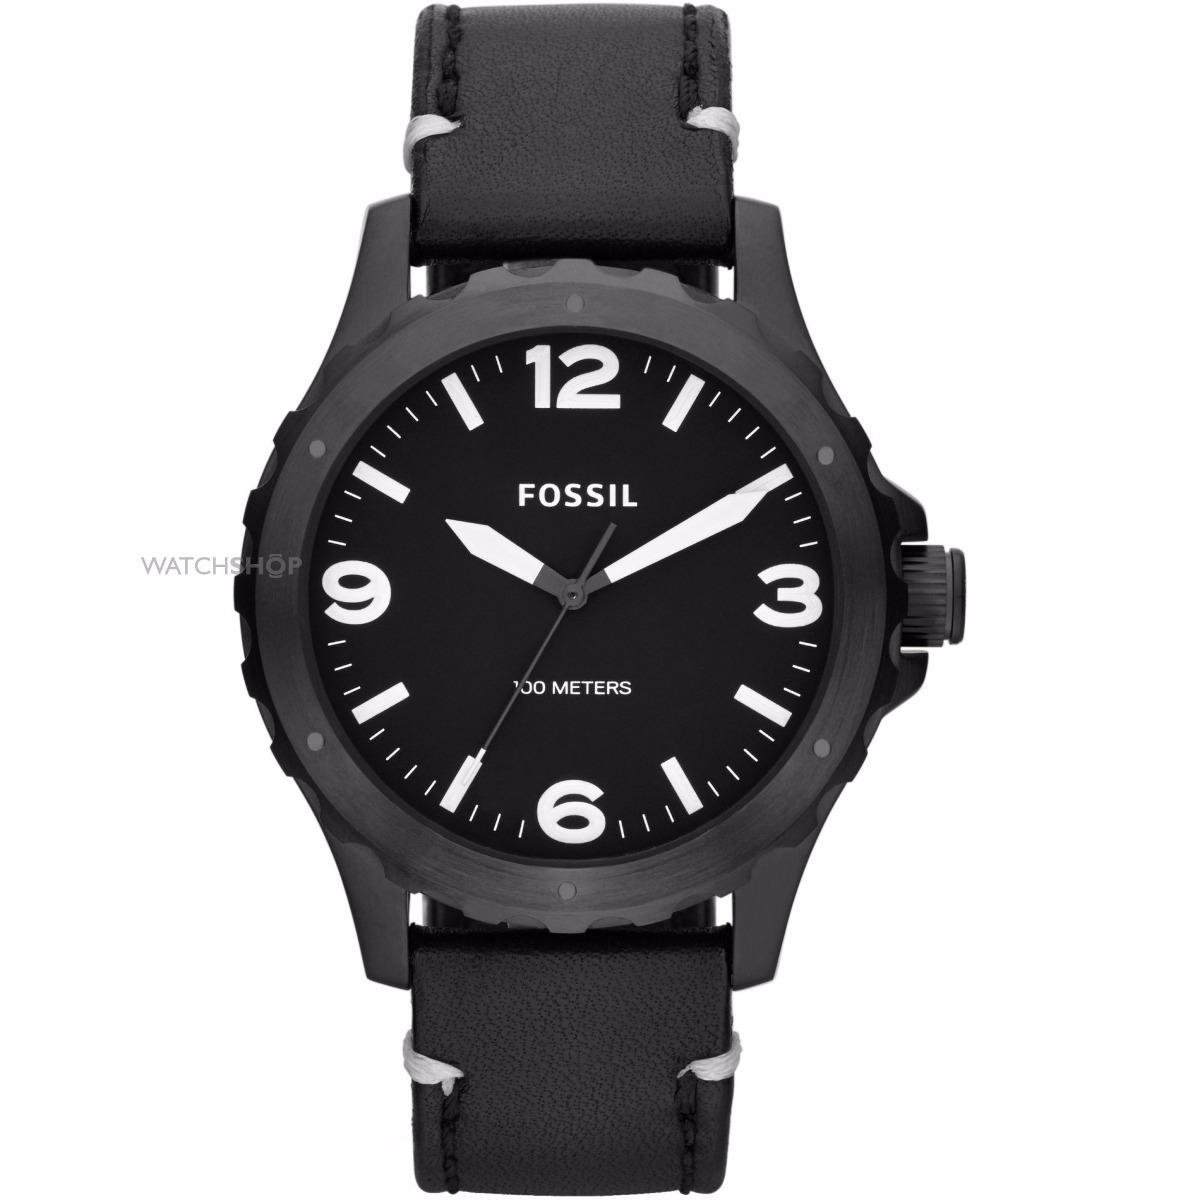 ca9d4f4712ce reloj fossil jr1448 negro deportivo remate hombre. Cargando zoom.